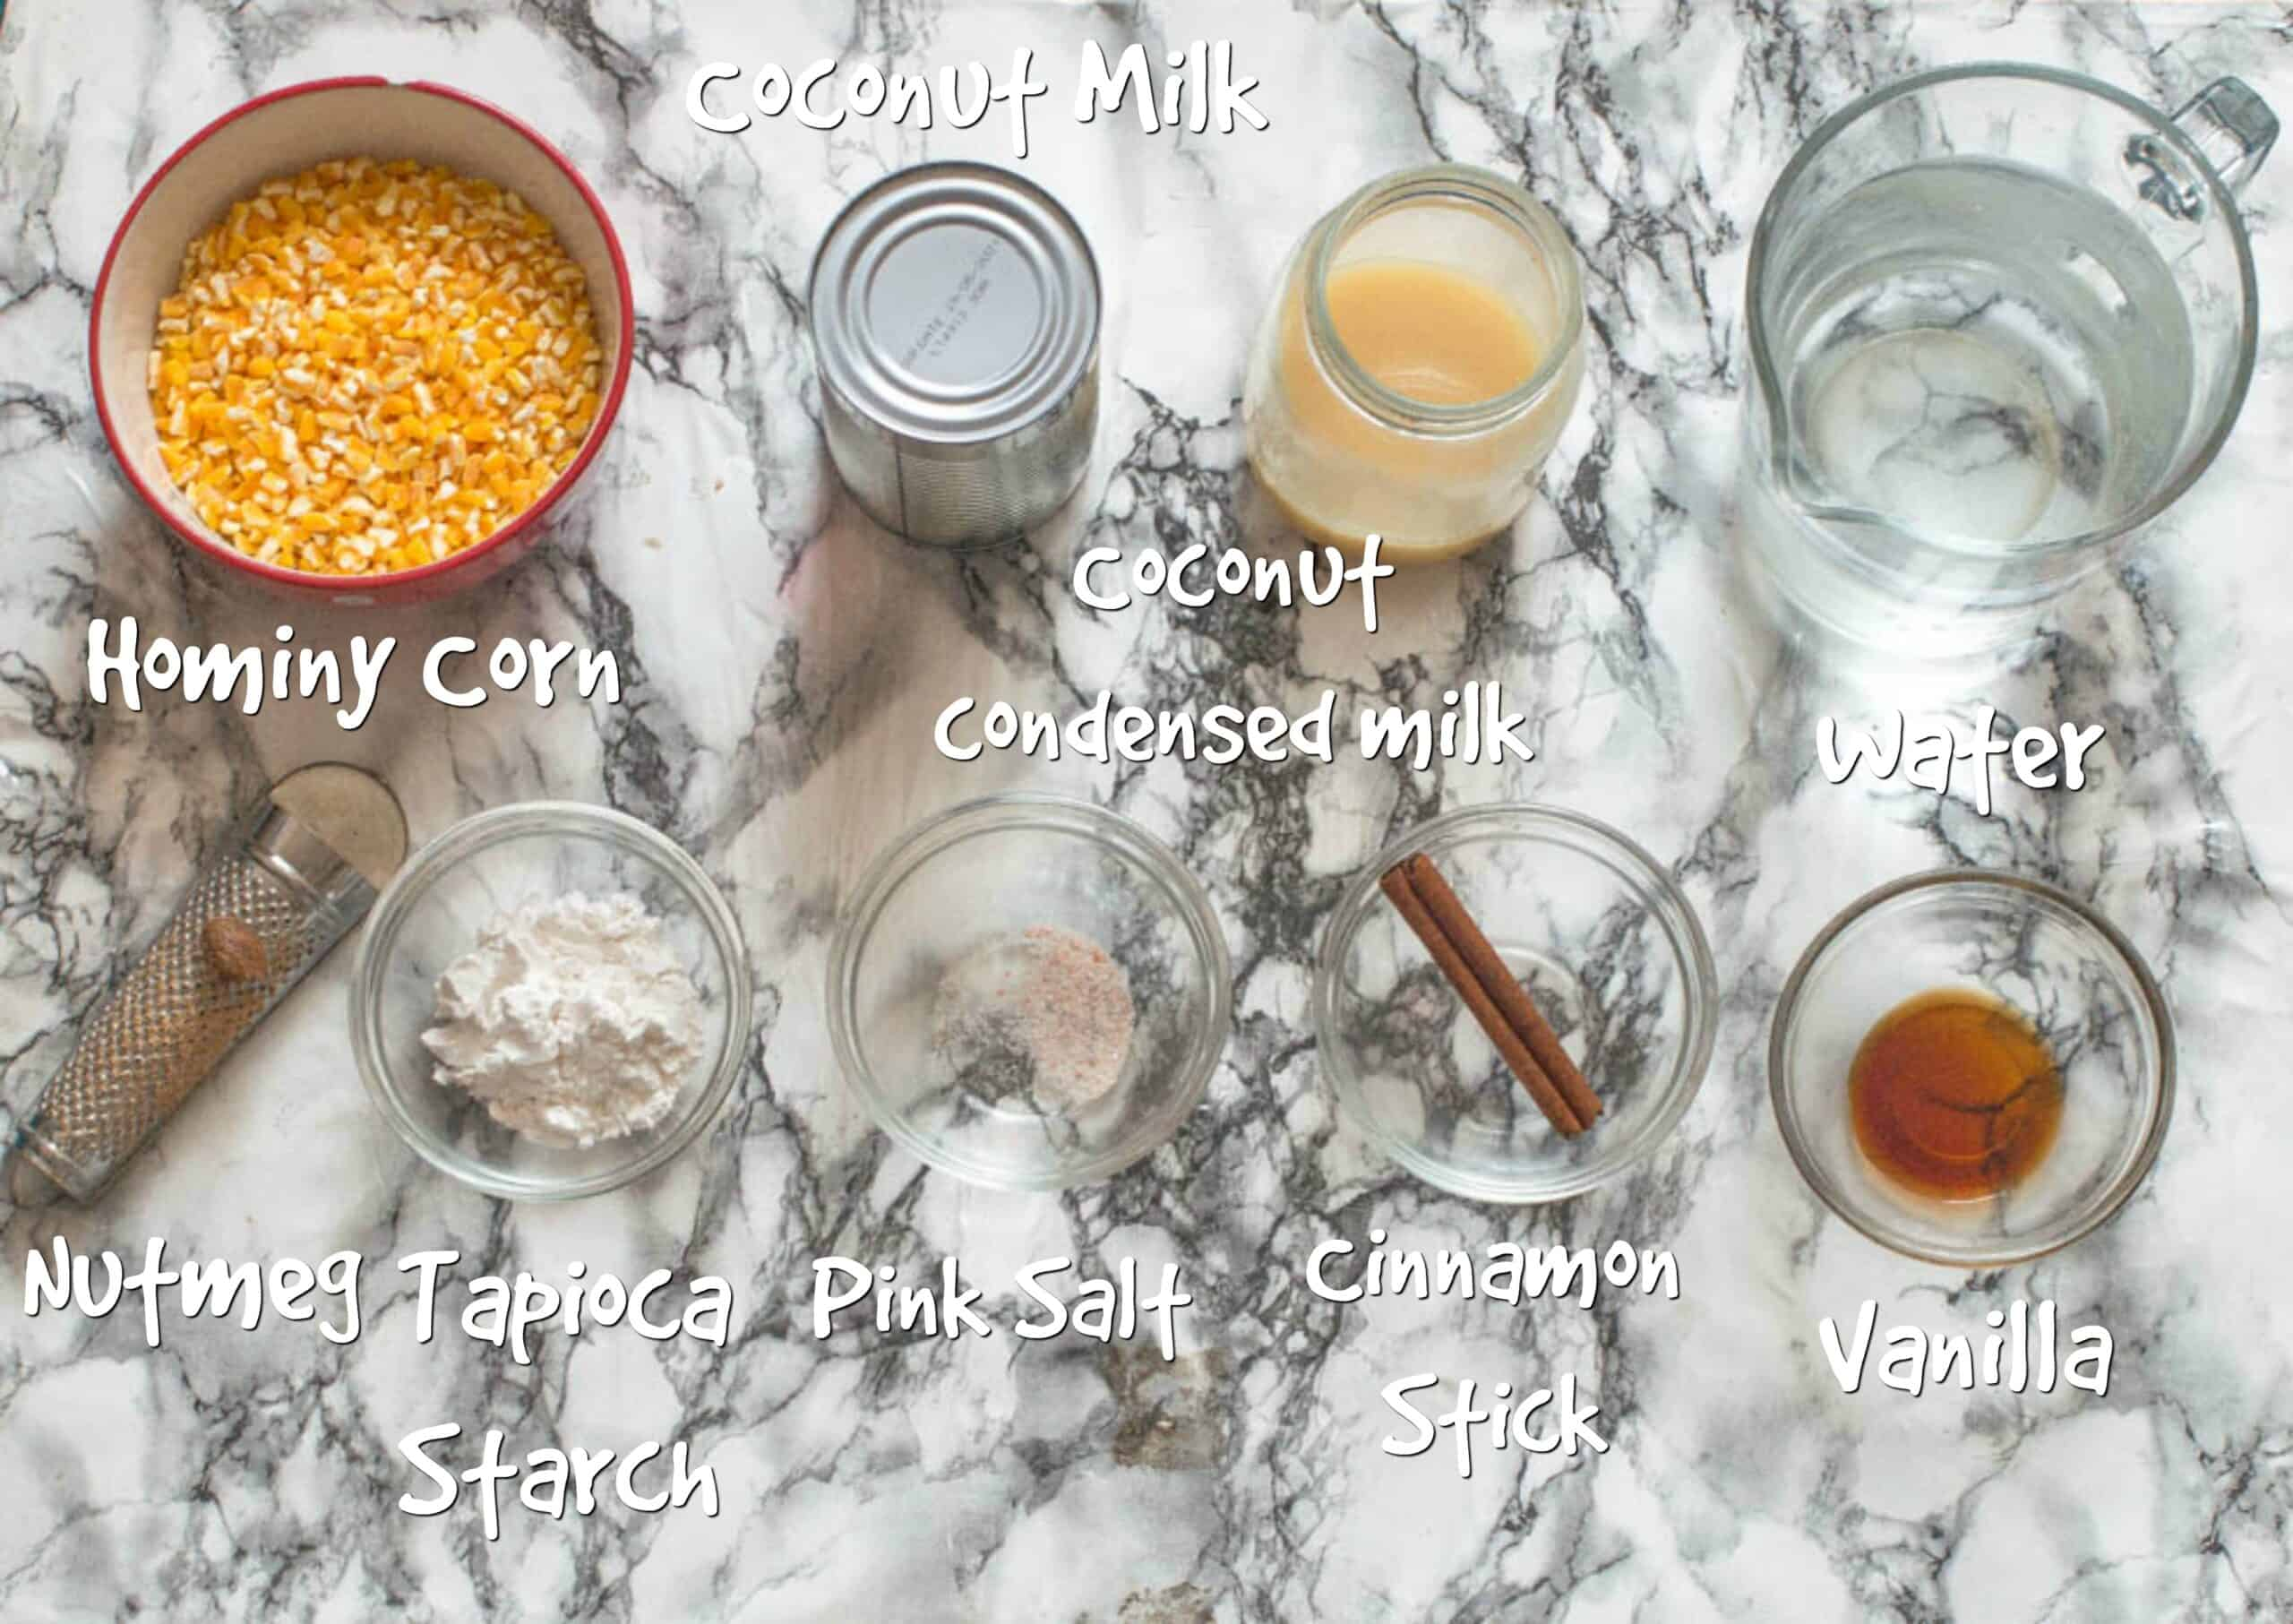 Ingredients for hominy corn porridge